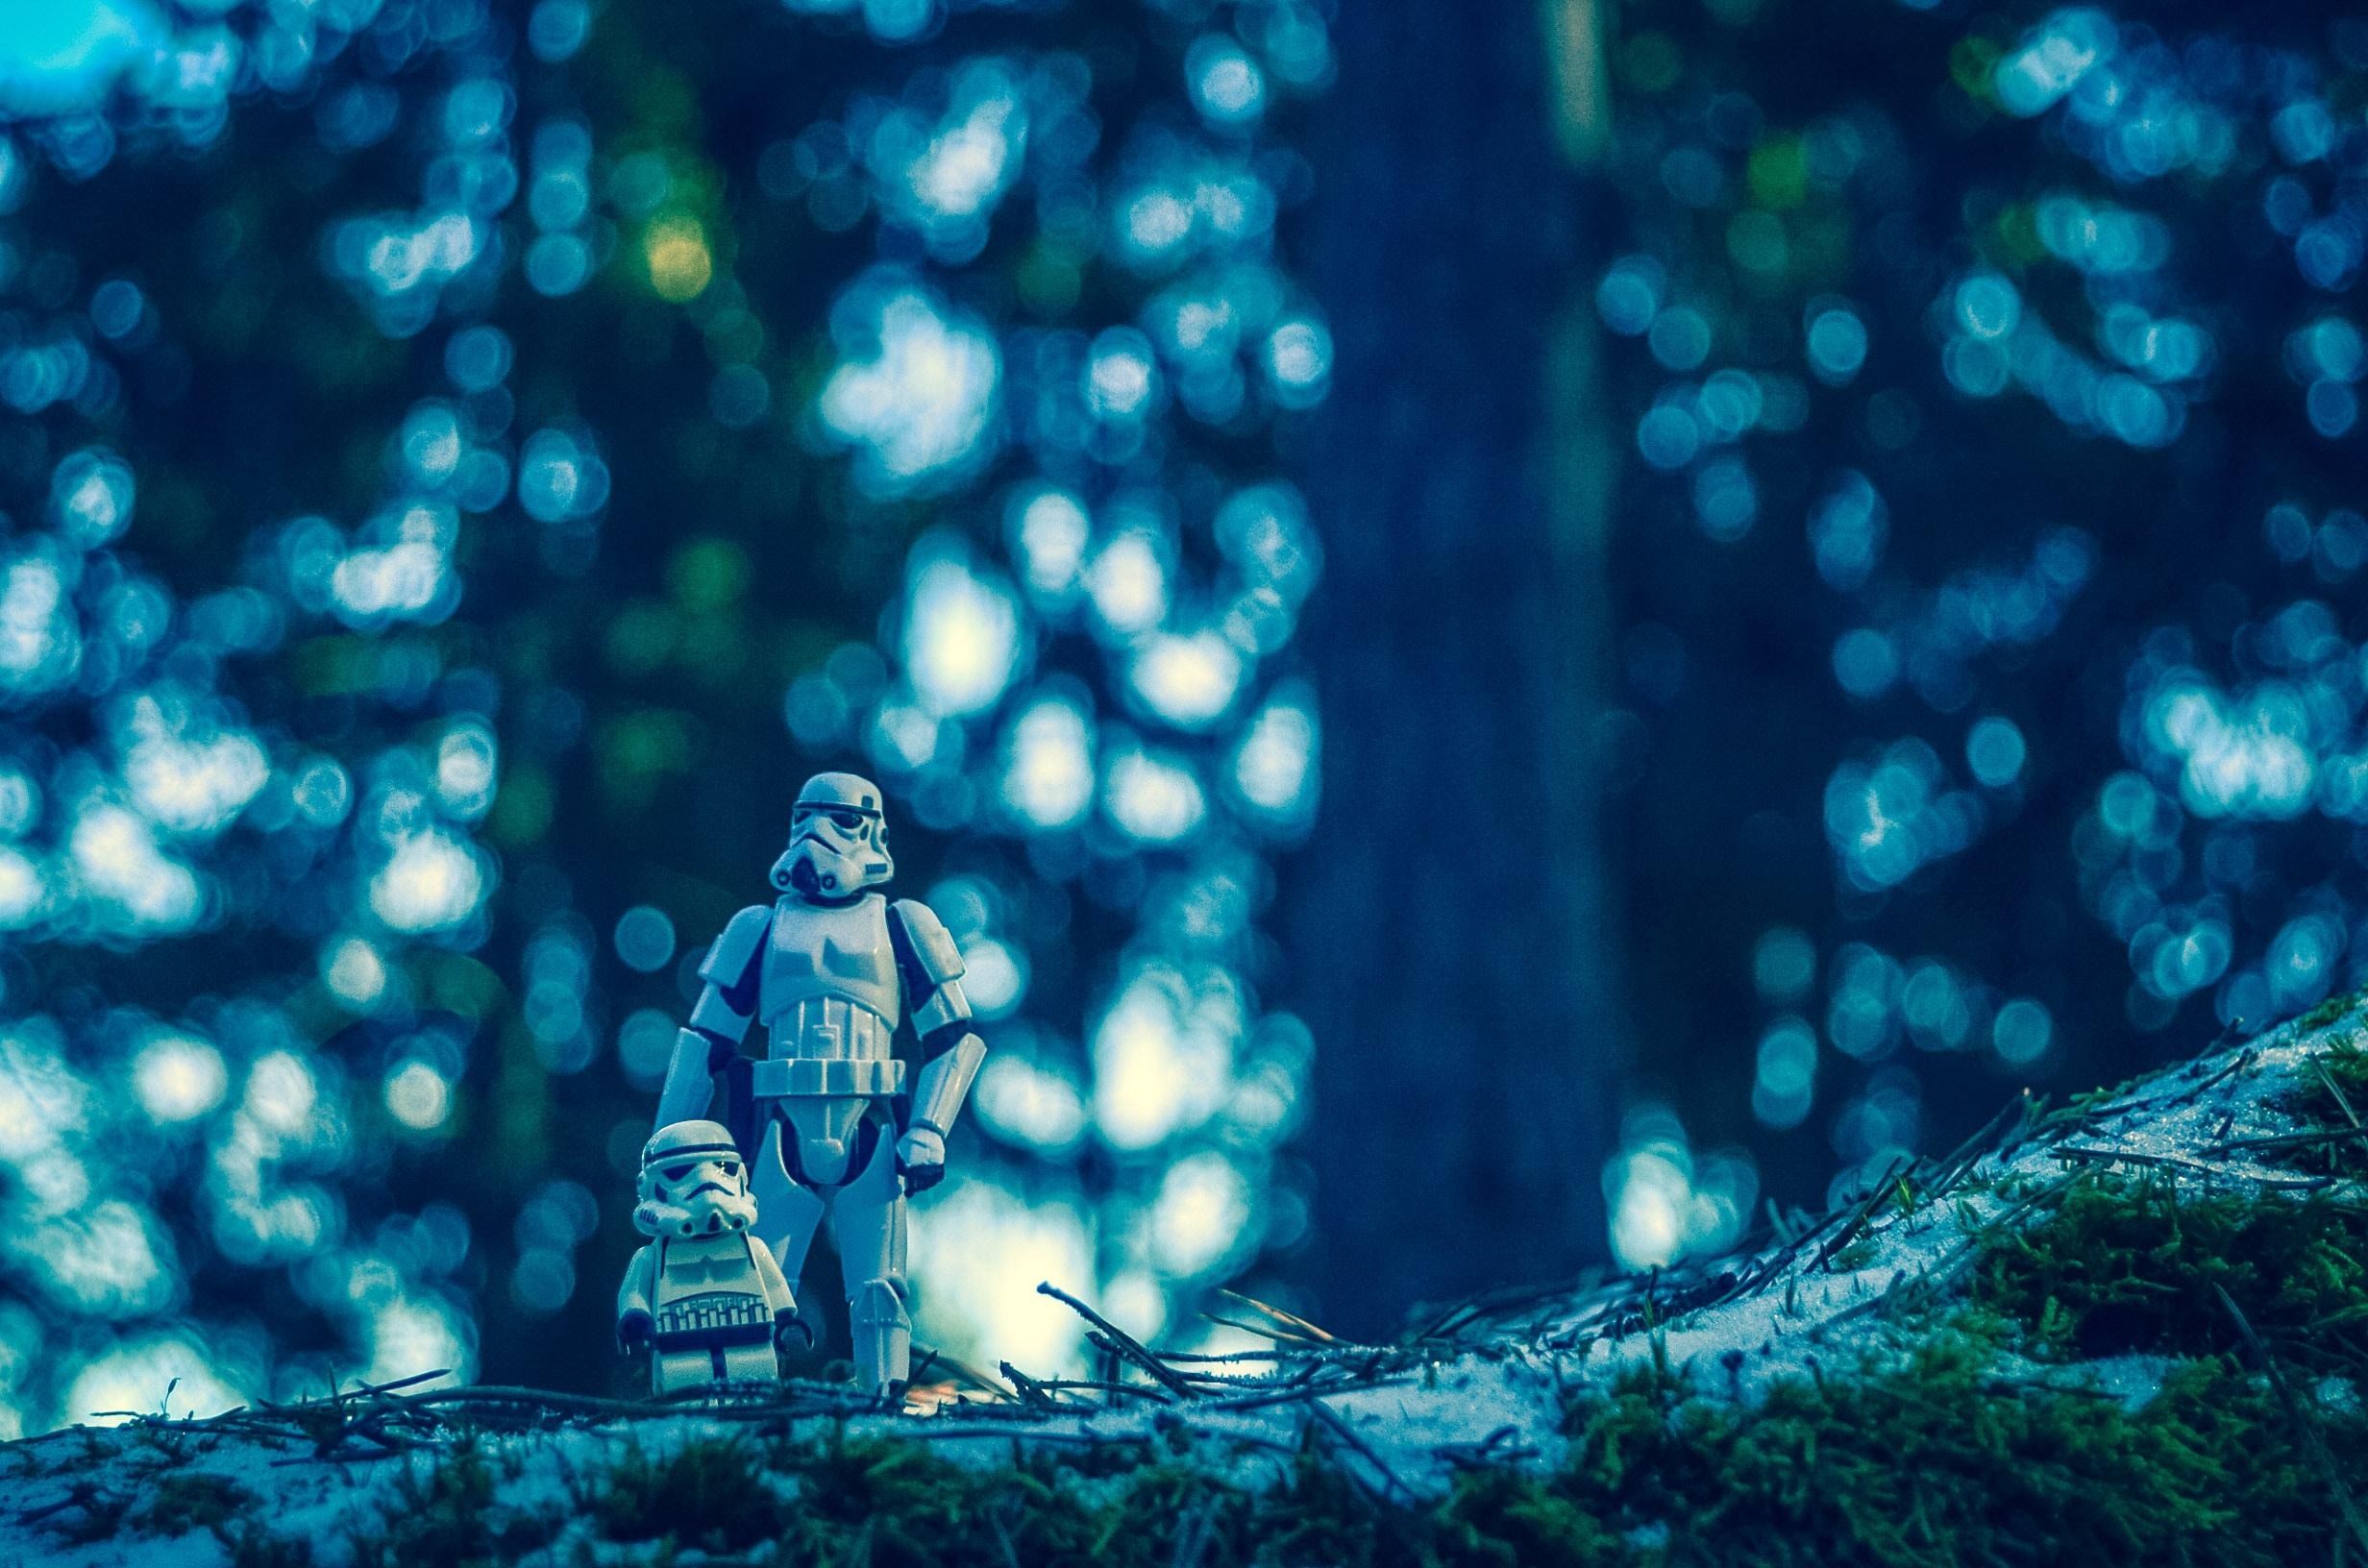 A Clone Trooper figure and a Lego Clone Trooper walking in the woods.